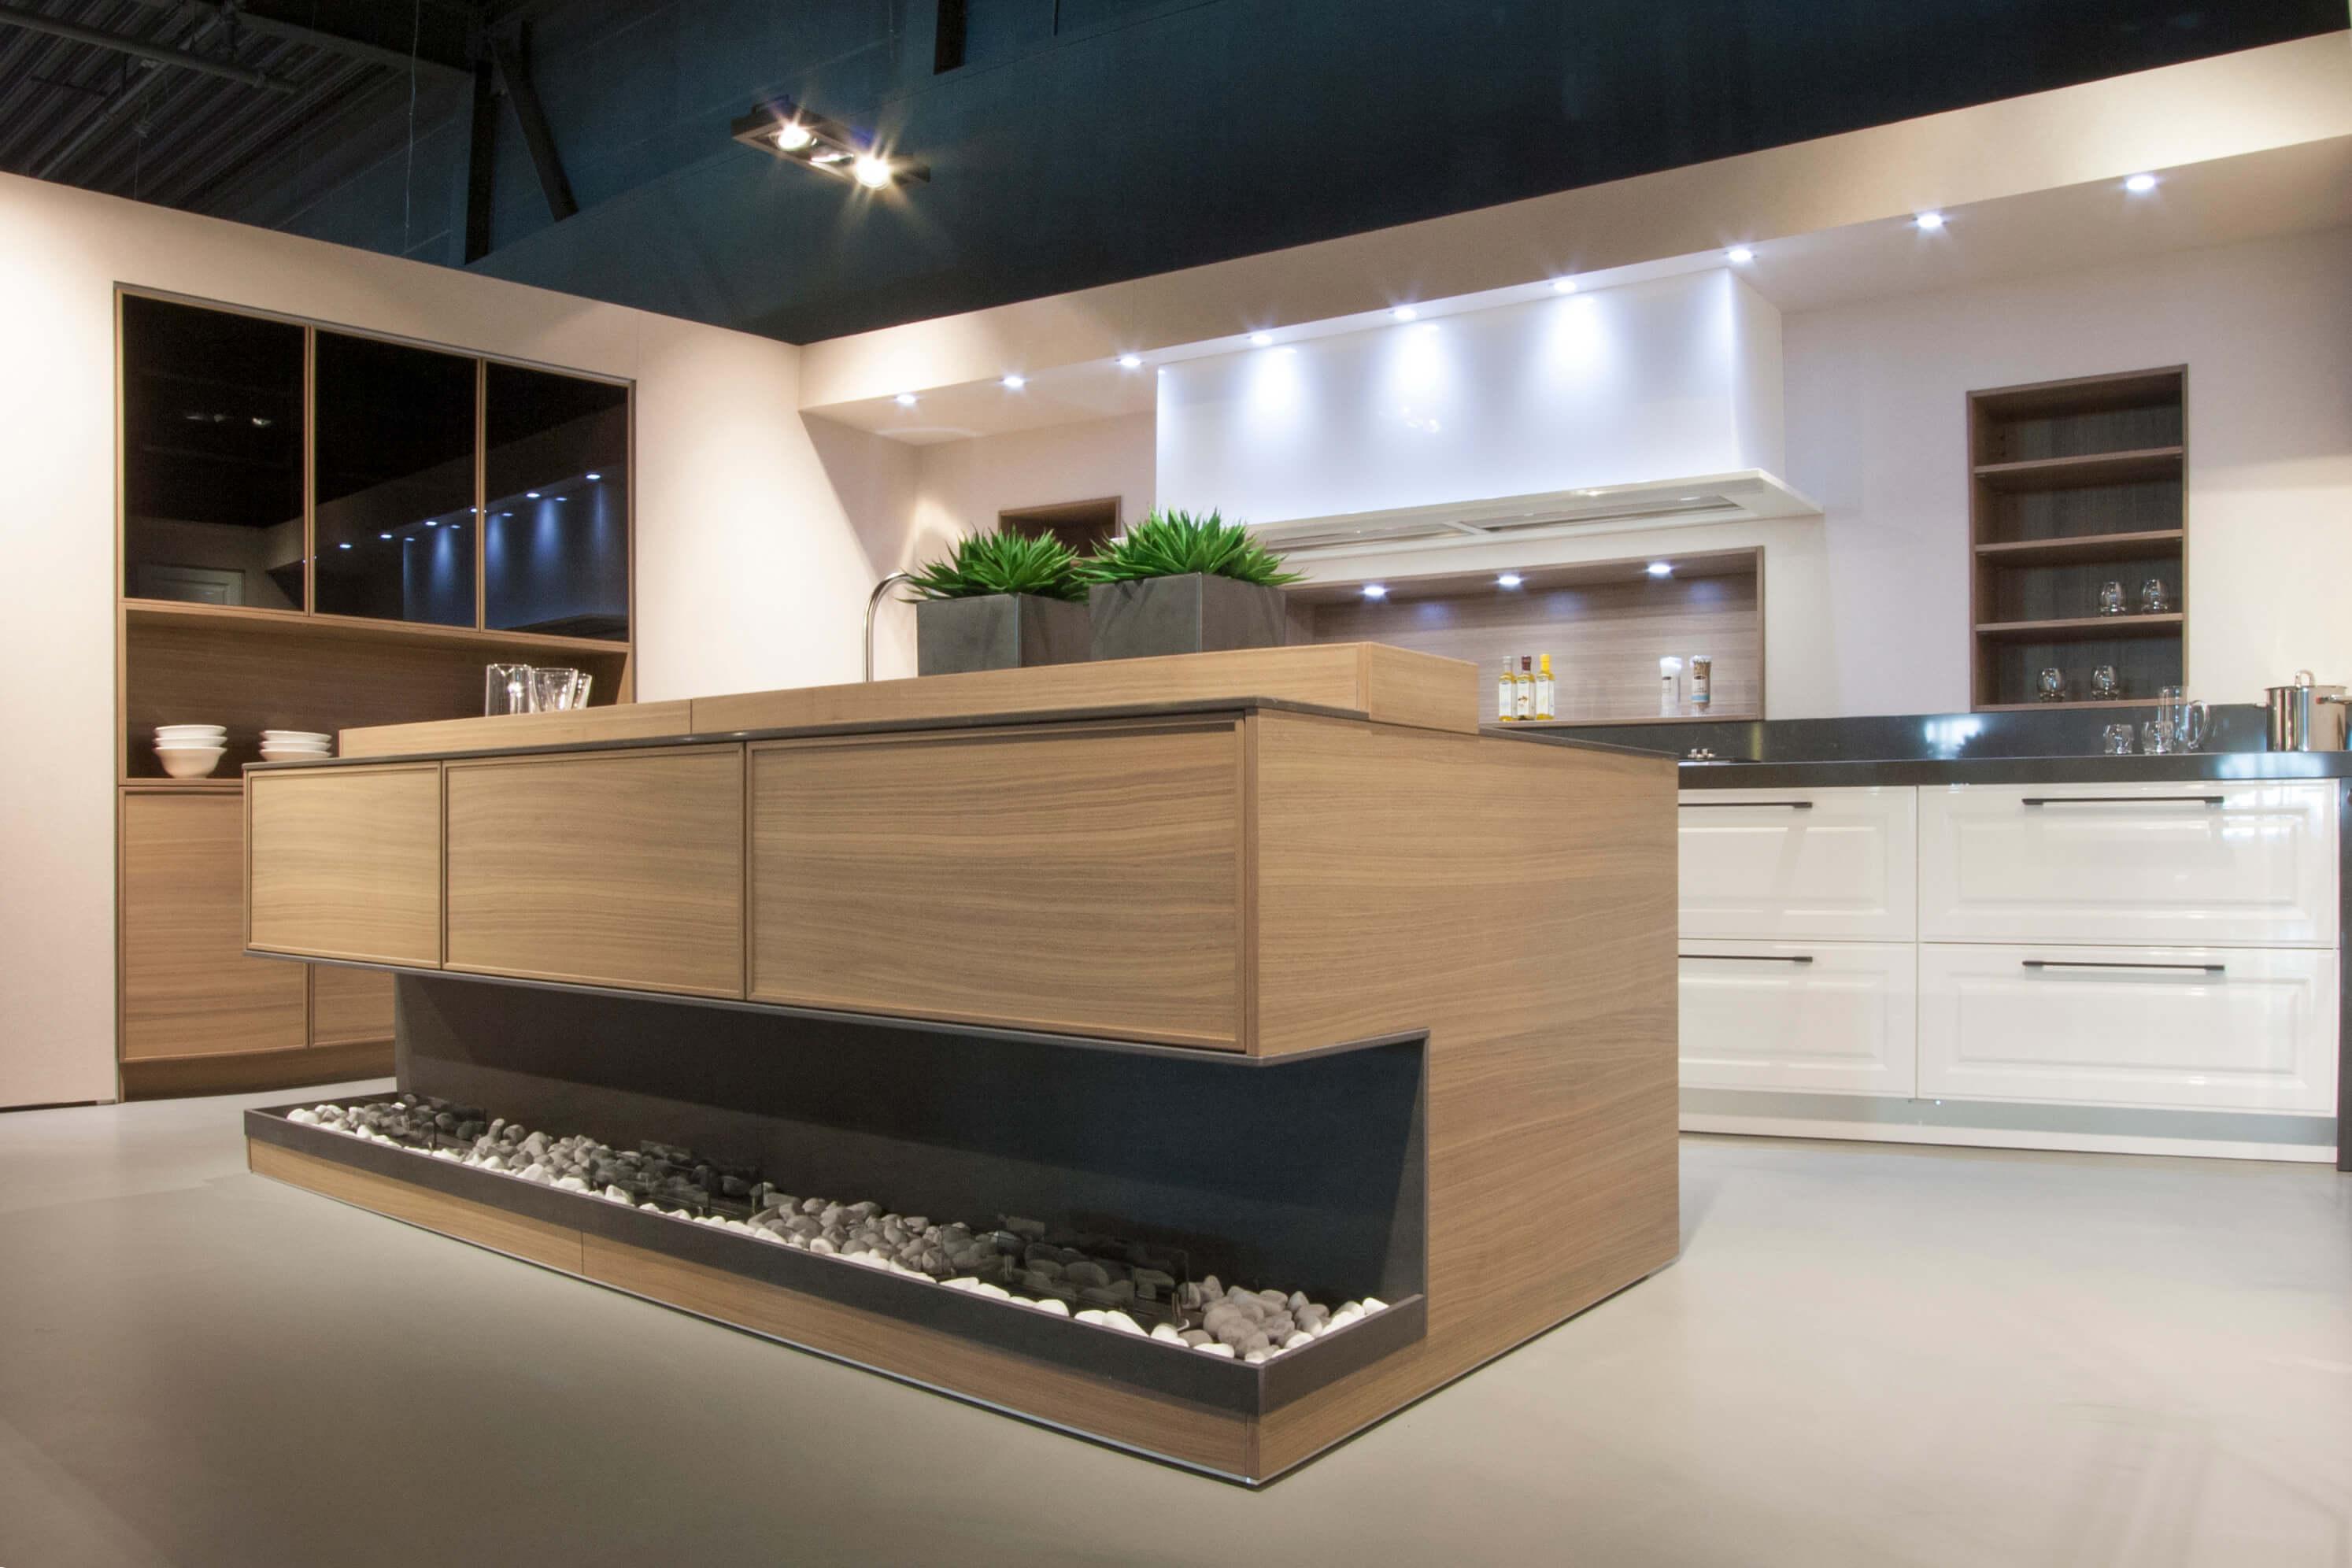 Moderne keukens showroommodel bij poggenpohl - Foto keuken amenagee ...